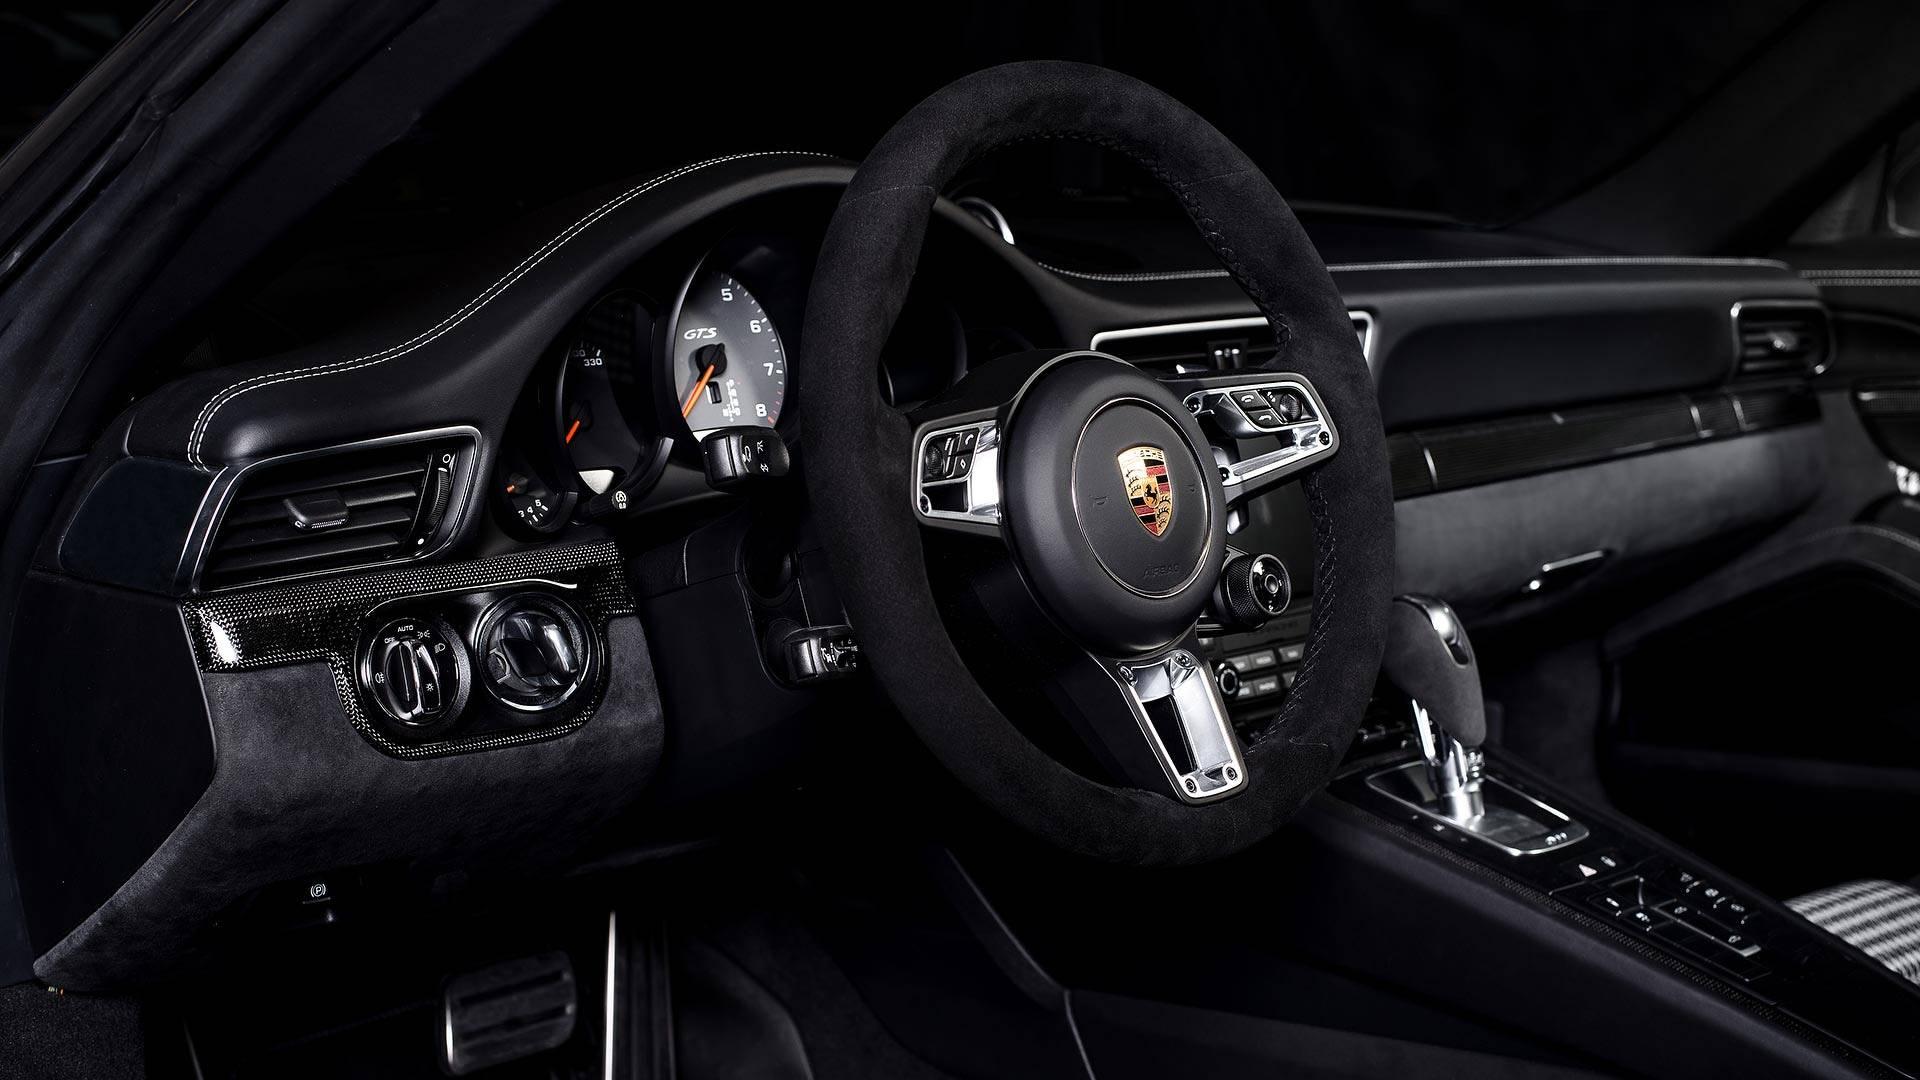 Porsche_911_Targa_GT3_by_Mcchip-dkr_0010